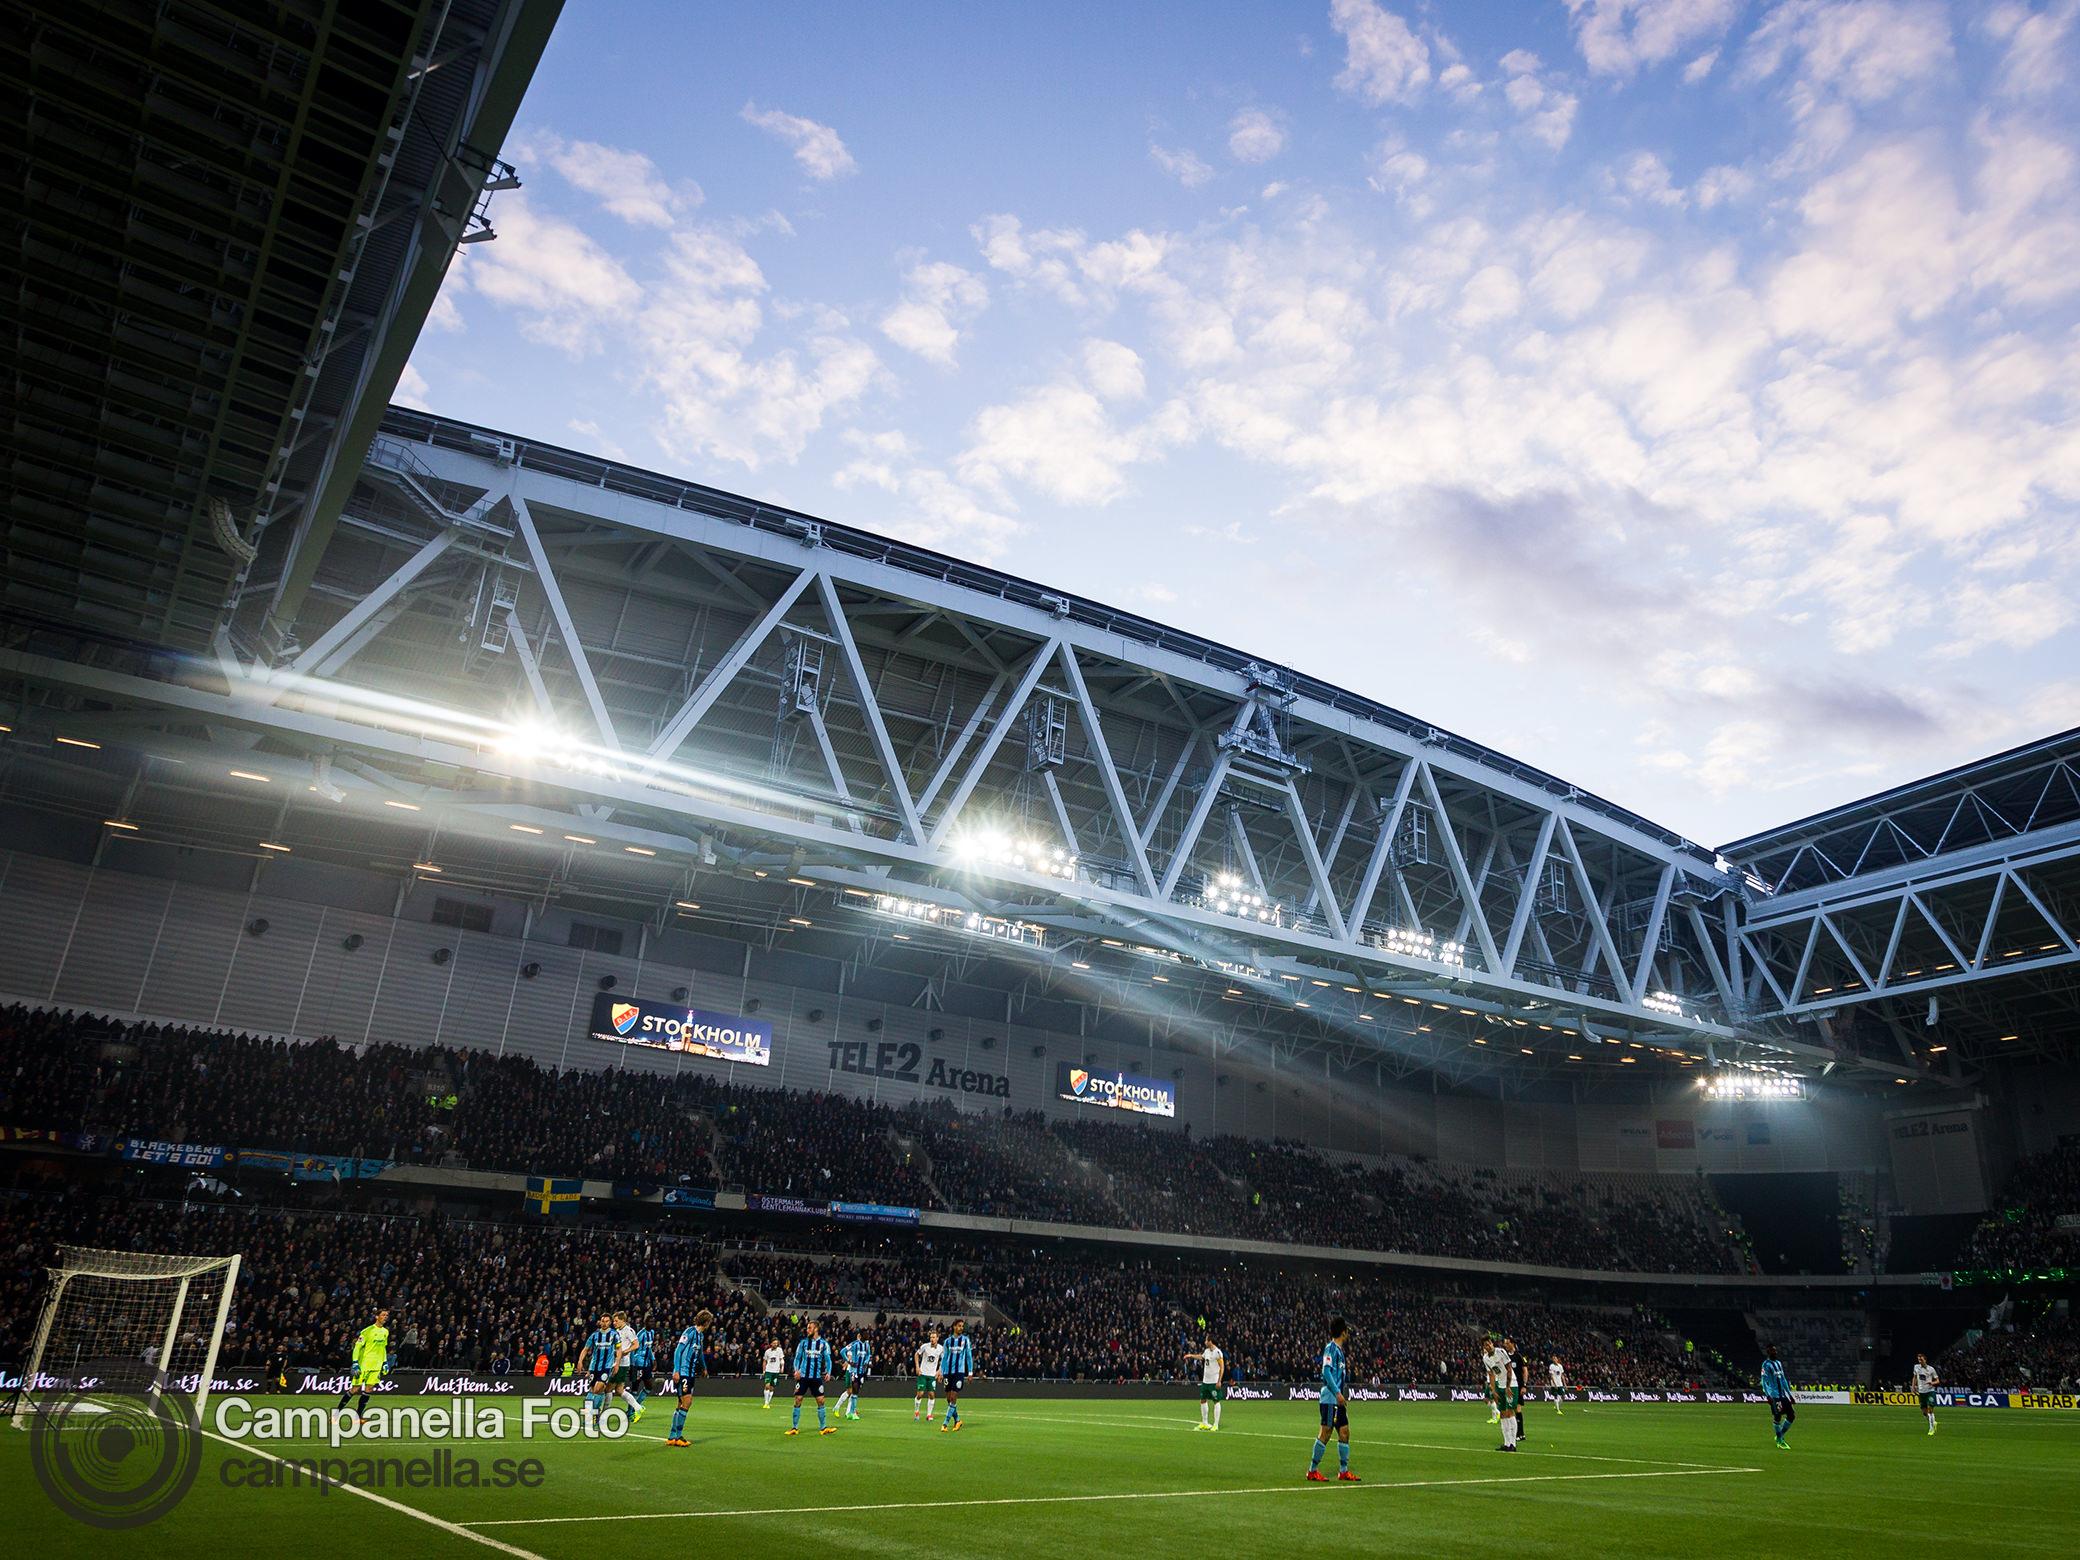 Hammarby take Djurgården in Stockholm derby - Michael Campanella Photography